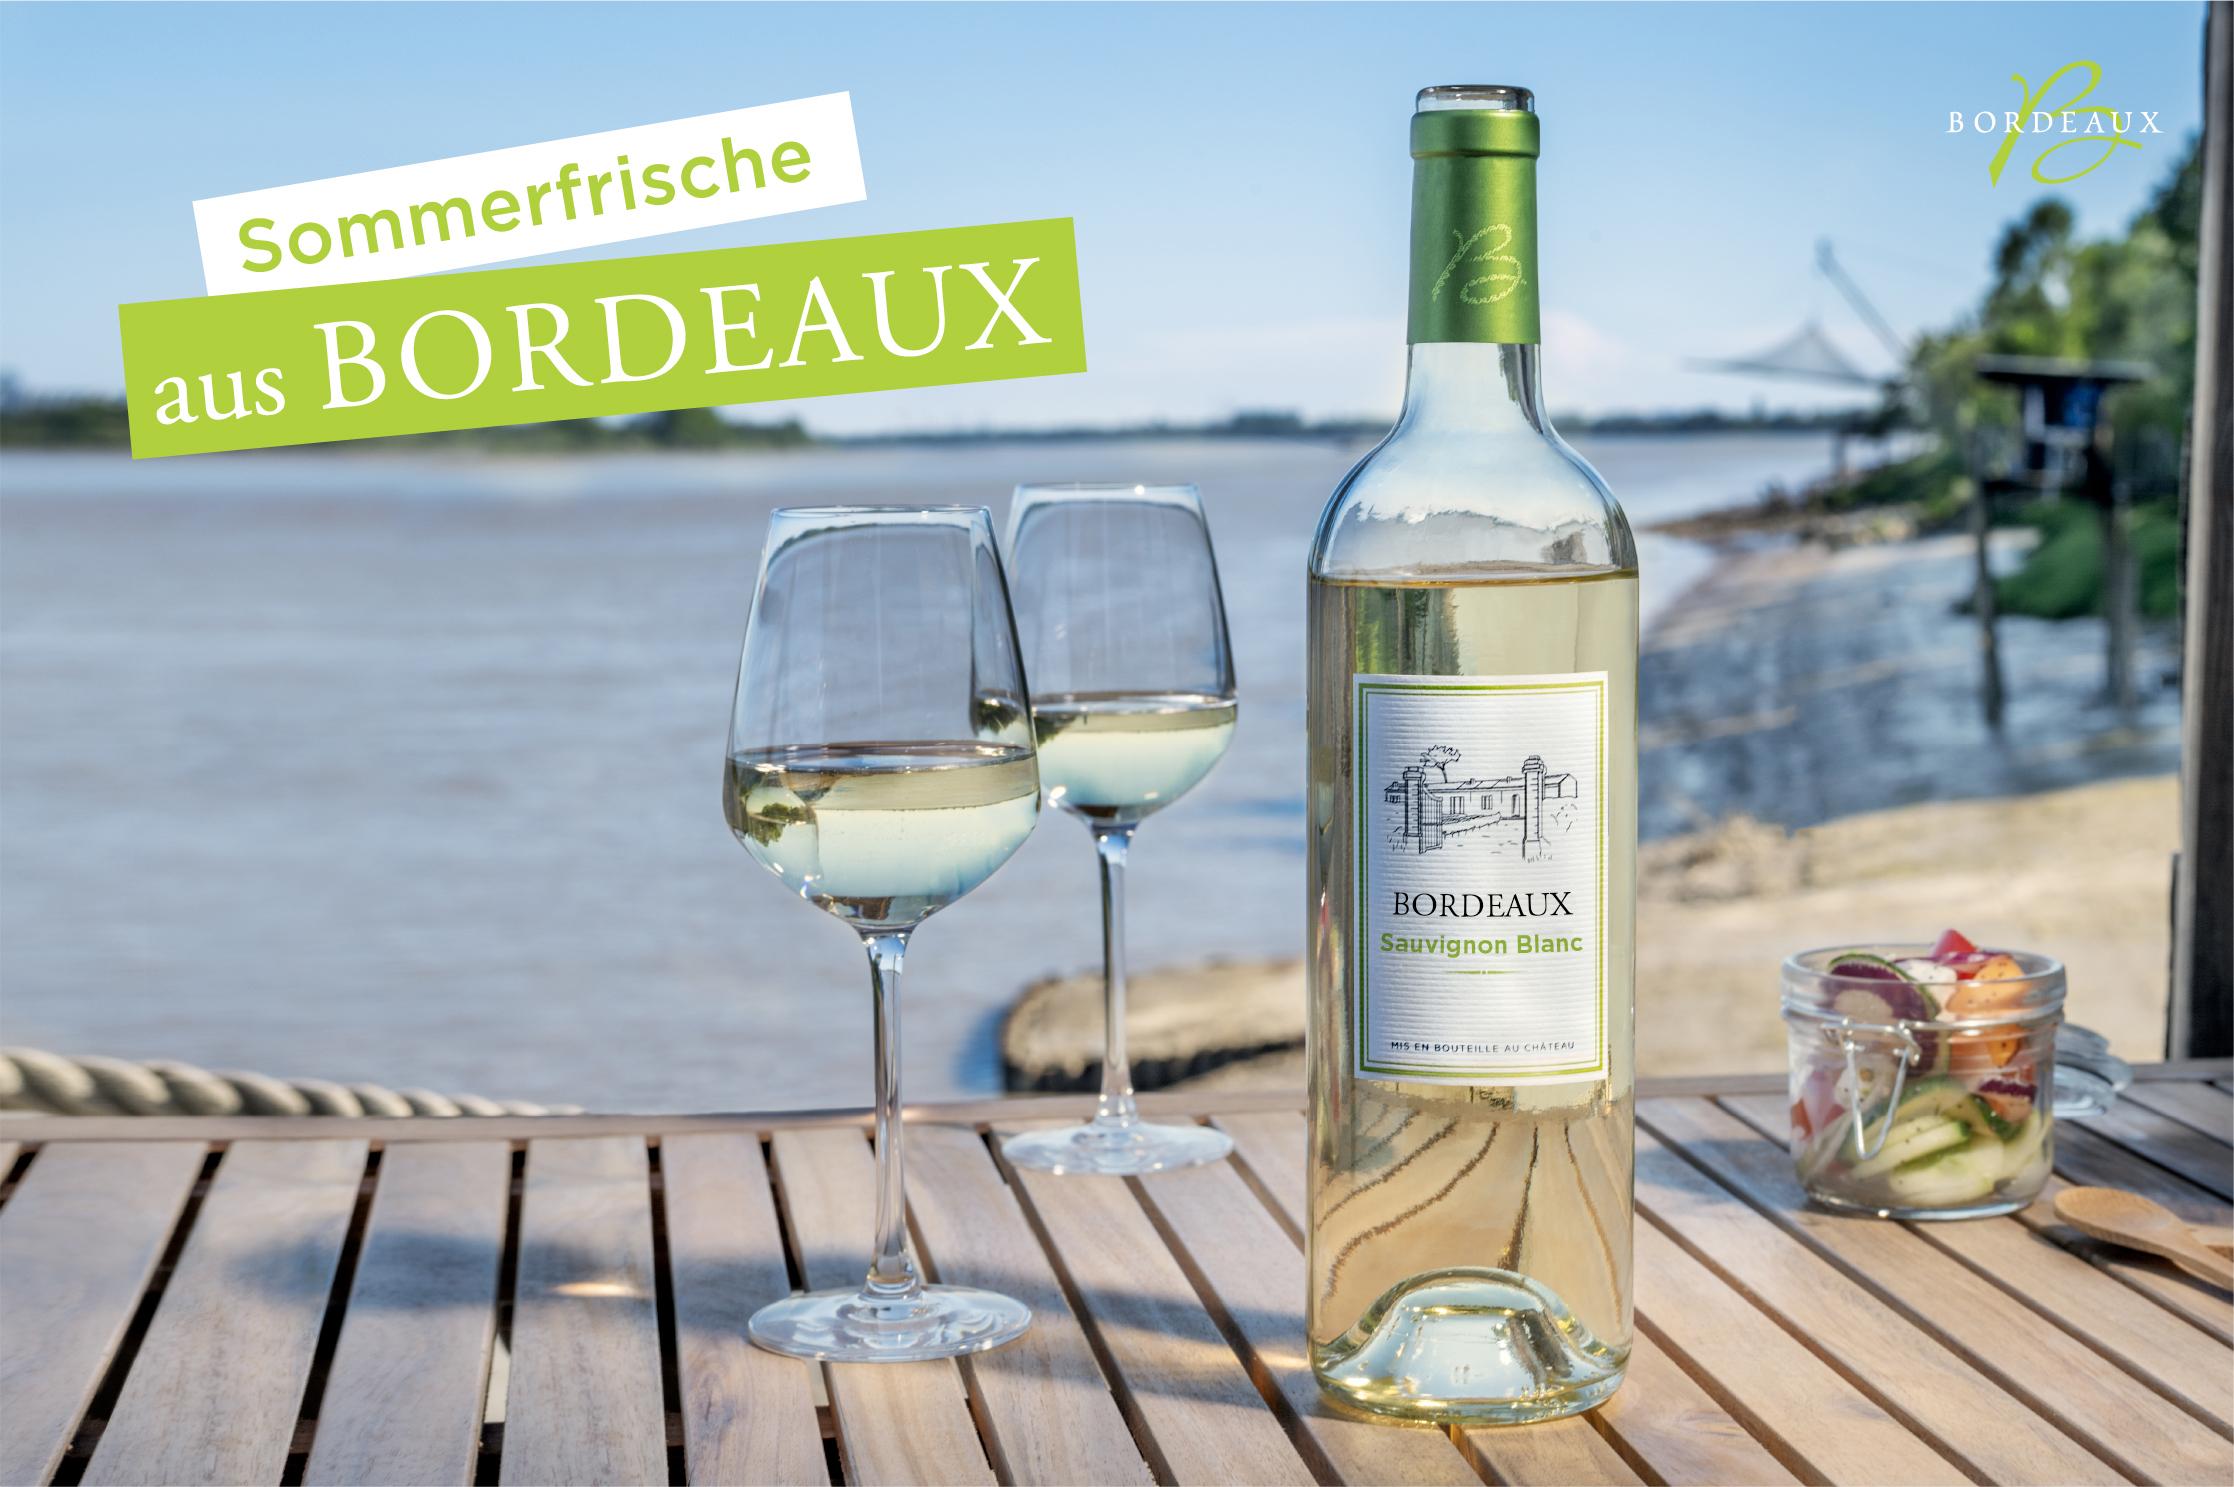 Atlantikküsten-Feeling mit weißen Bordeaux-Weinen